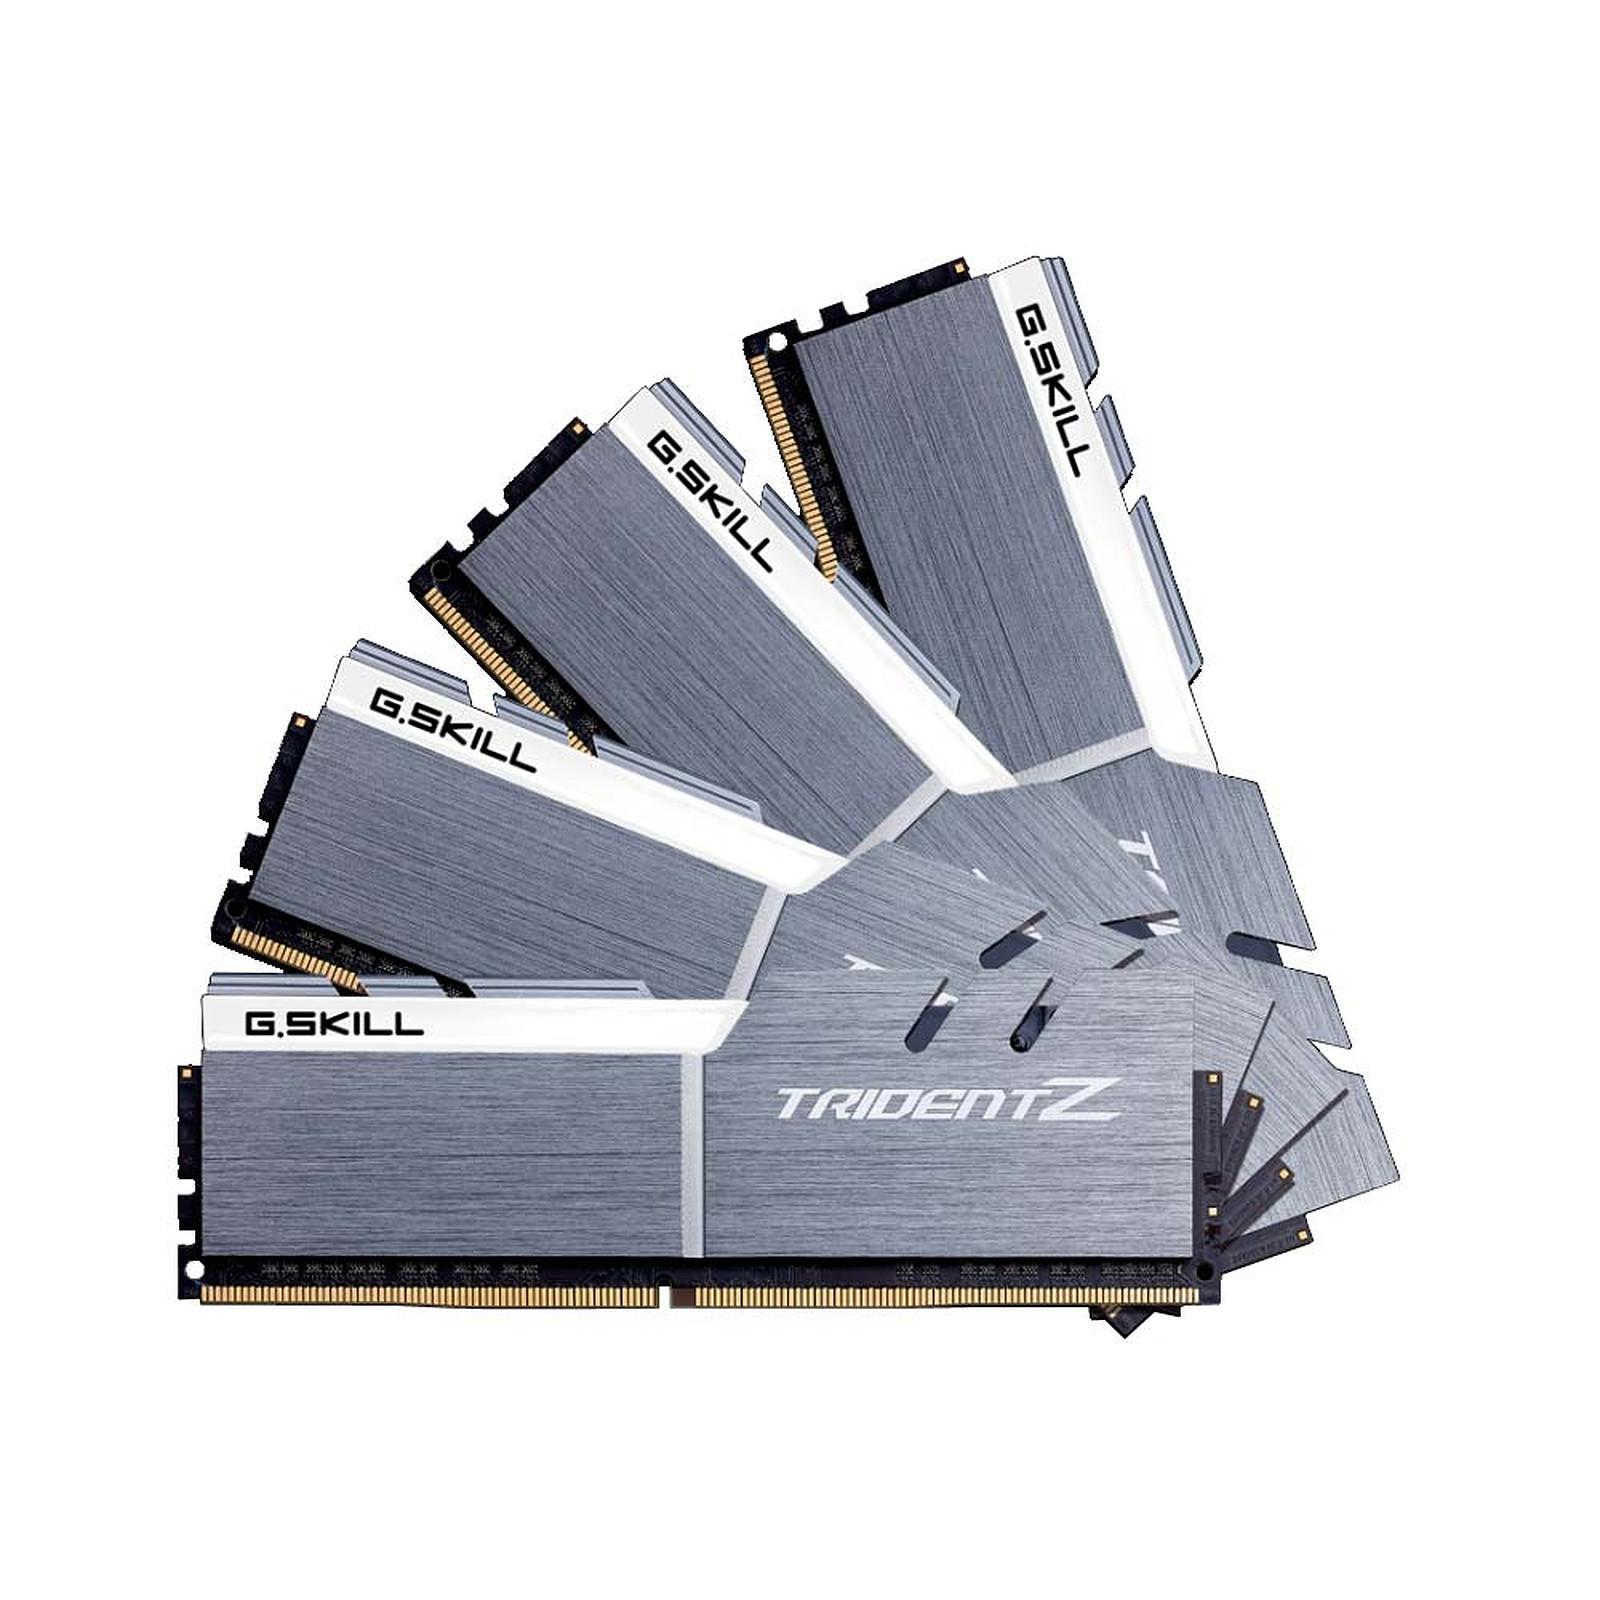 G.Skill Trident Z 64 Go (4x 16 Go) DDR4 3200 MHz CL15